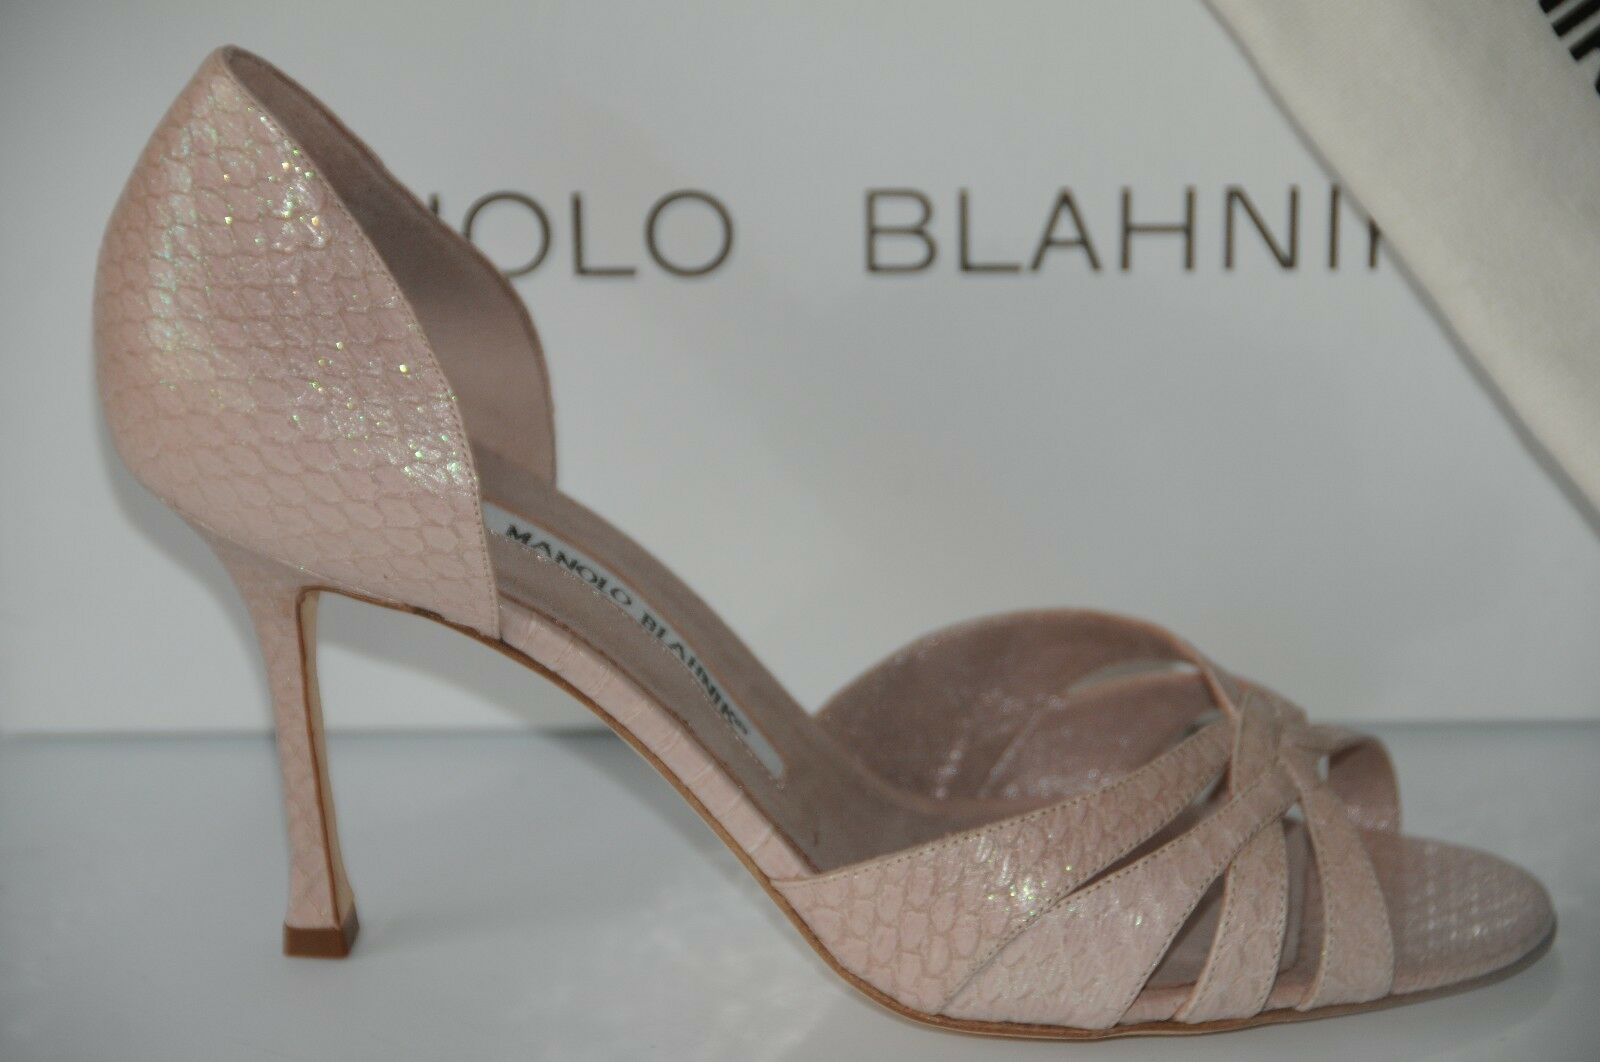 NEW MANOLO BLAHNIK dorsay whiteHIDO 90 Glitter SNAKESKIN Nude pink SHOES 40.5 40